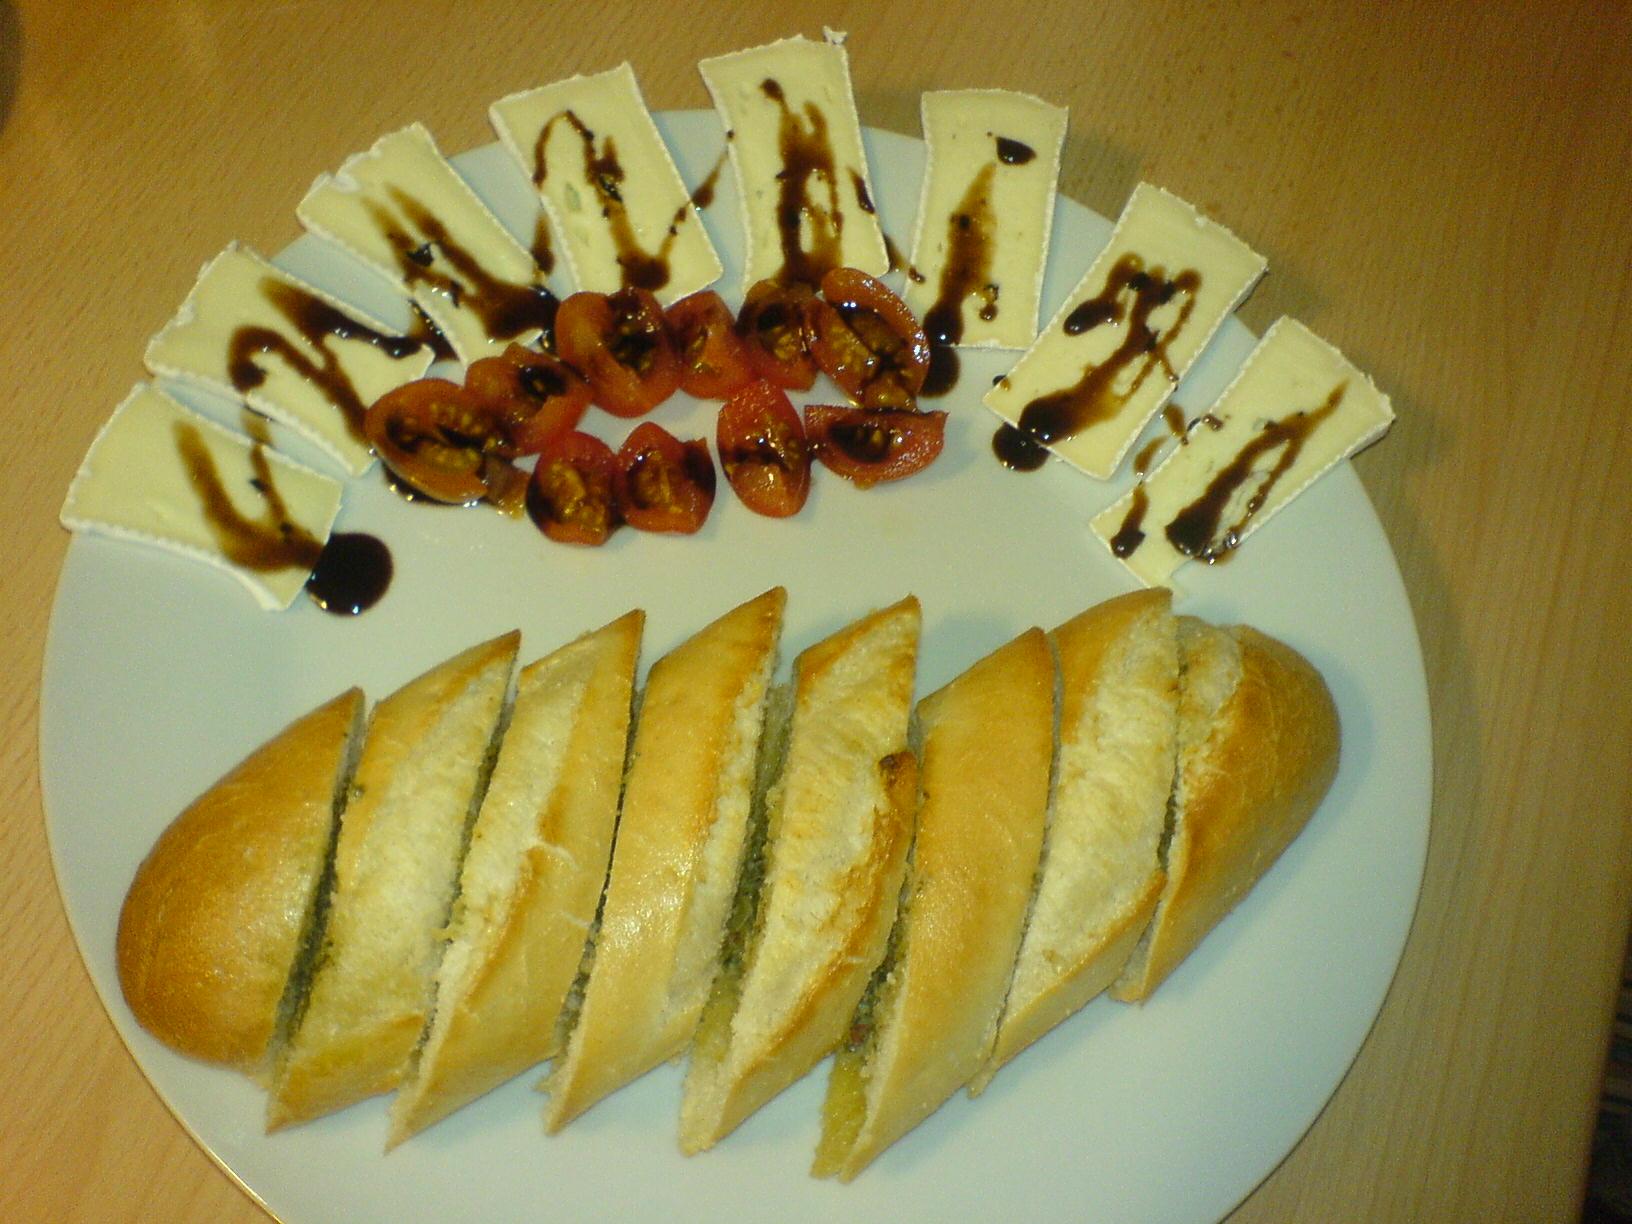 https://foodloader.net/Holz_2010-02-08_Kraeuterbaguette_mit_Camembert_und_Tomaten.jpg